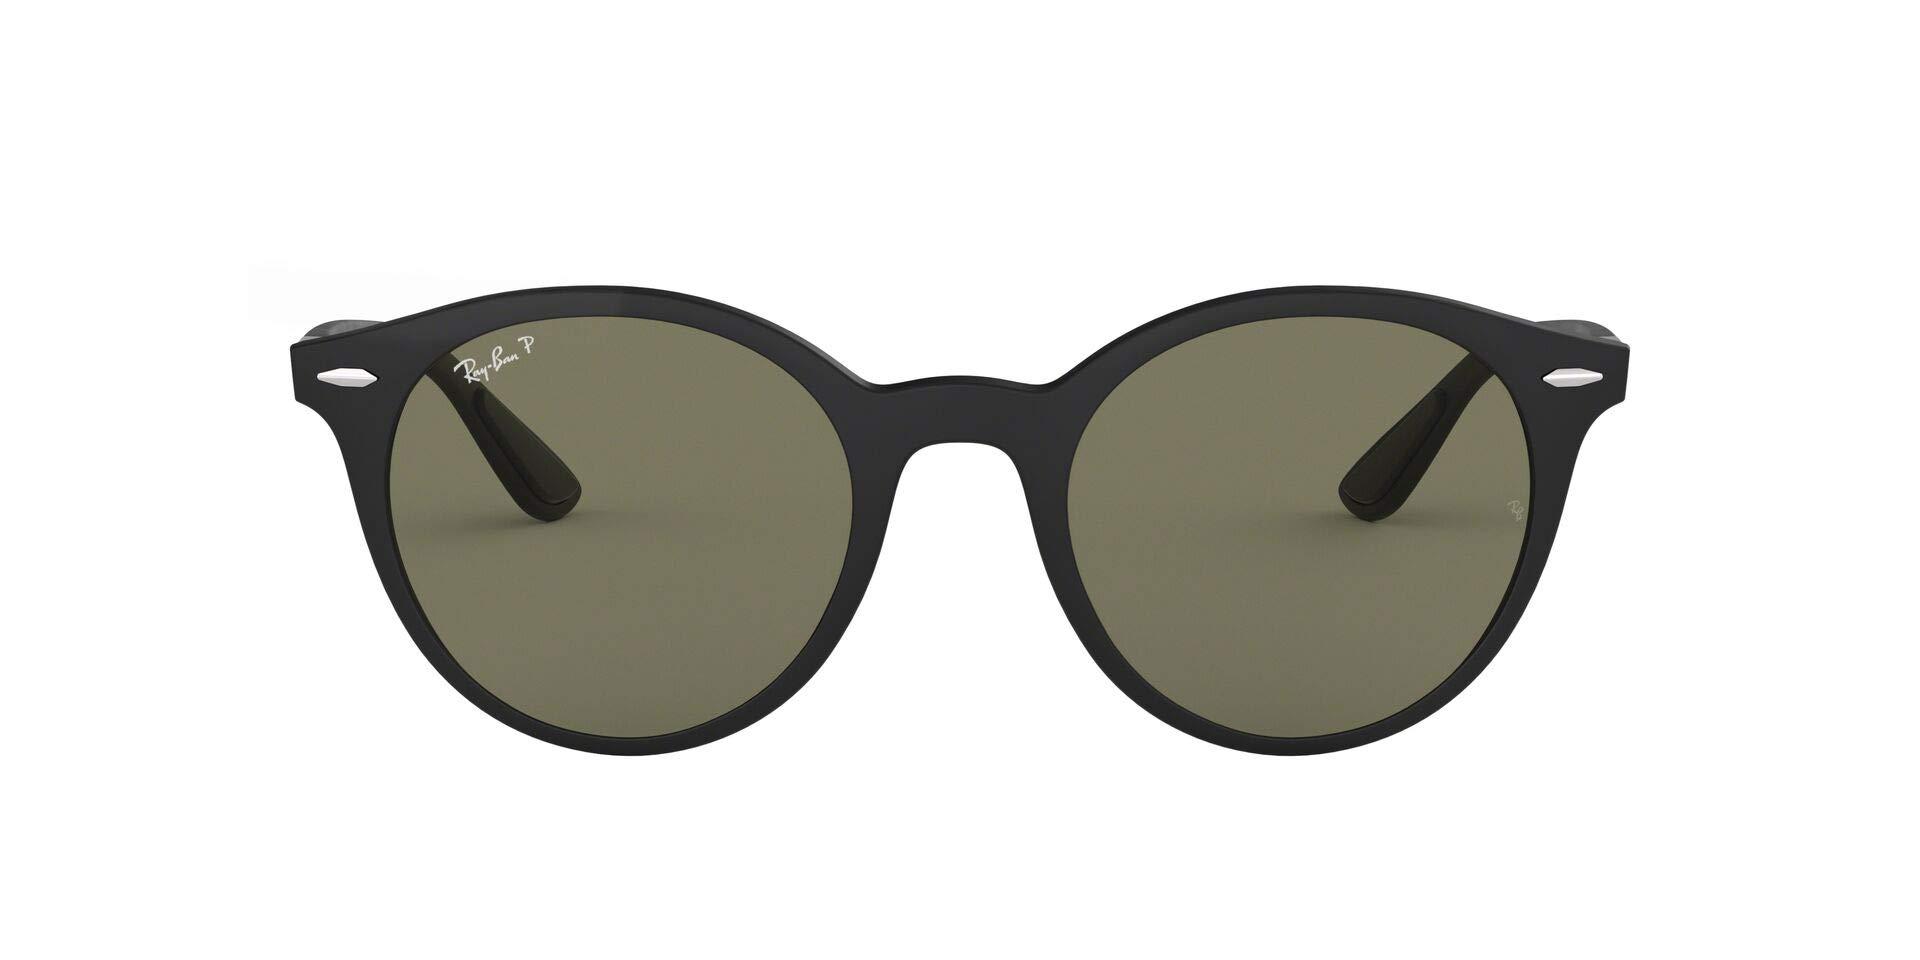 Ray-Ban Rb4296 Round Sunglasses